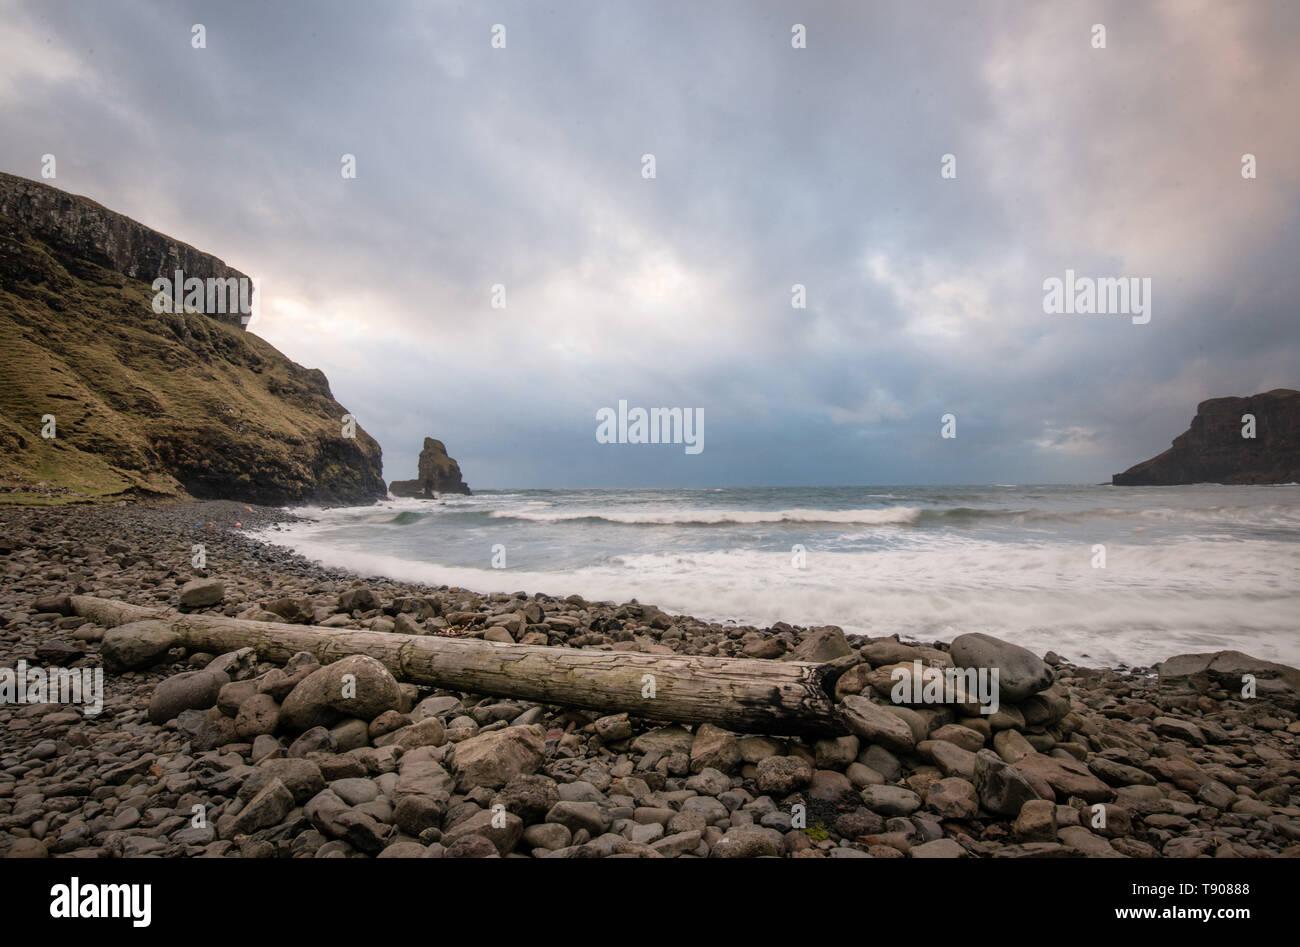 Talisker Bay, Isle of Skye, Scotland - Stock Image